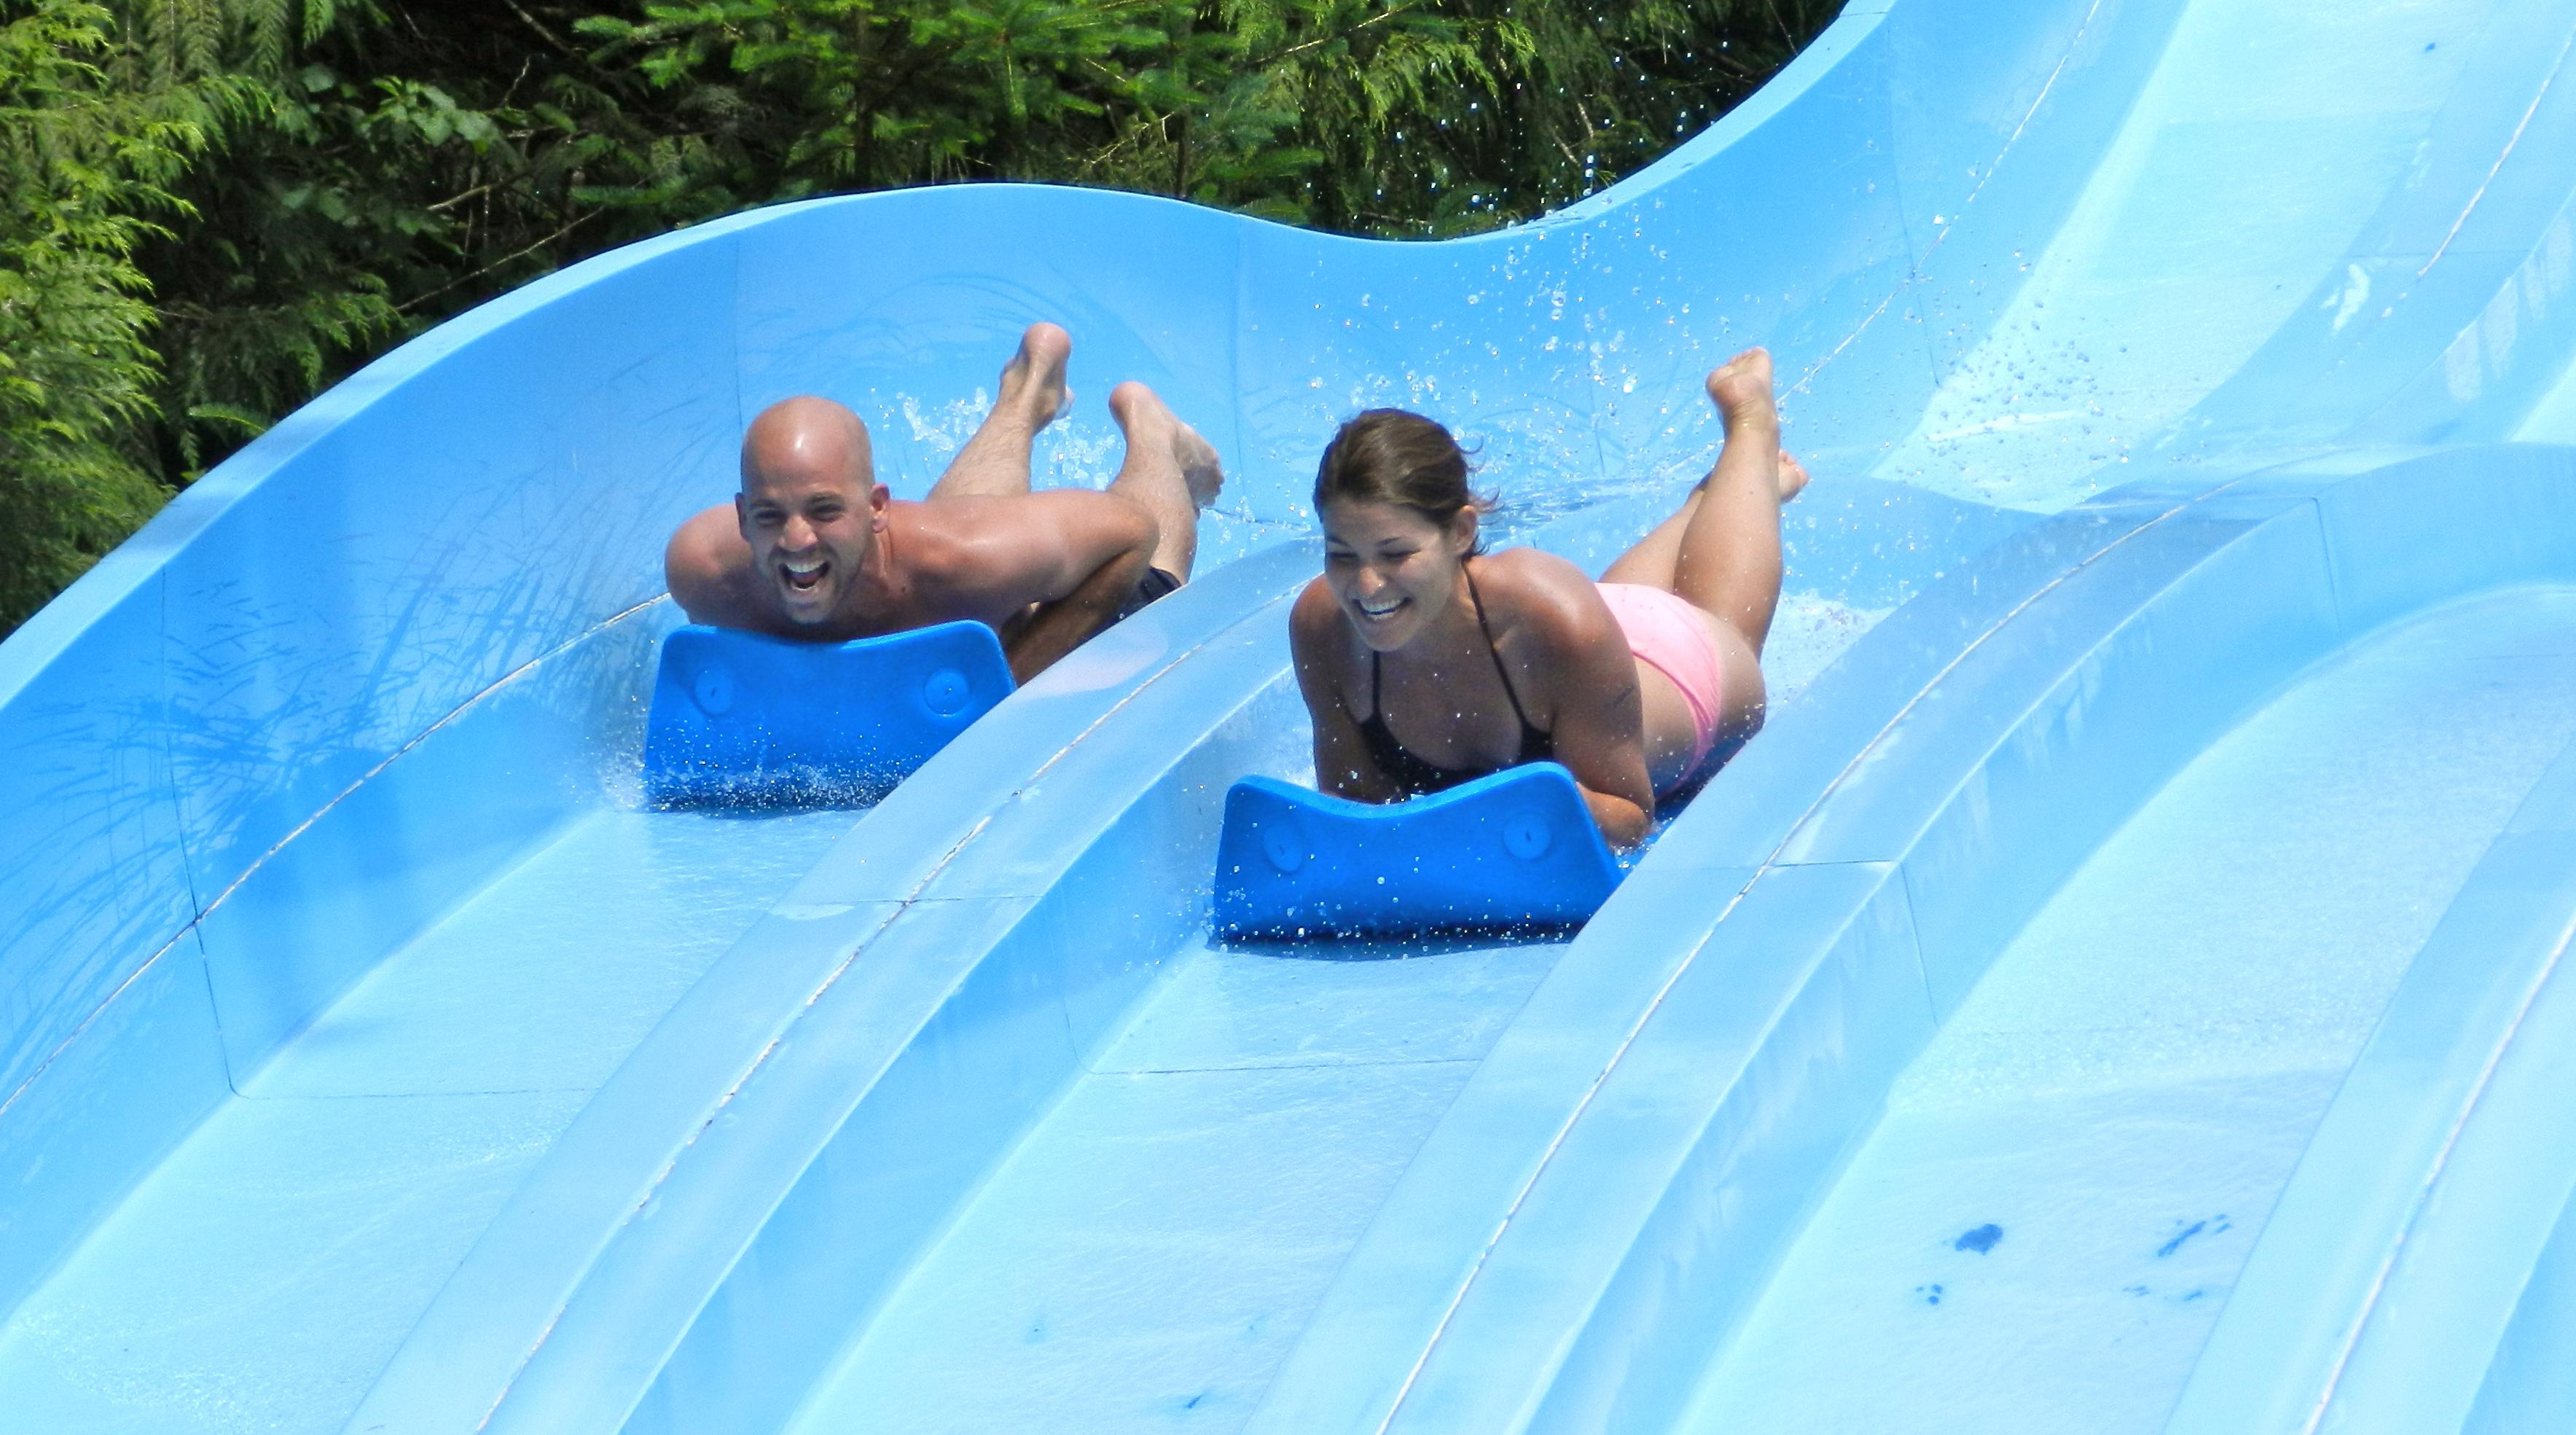 Plenty of summer left to hit up Cultus Lake Waterpark & Adventure Park!